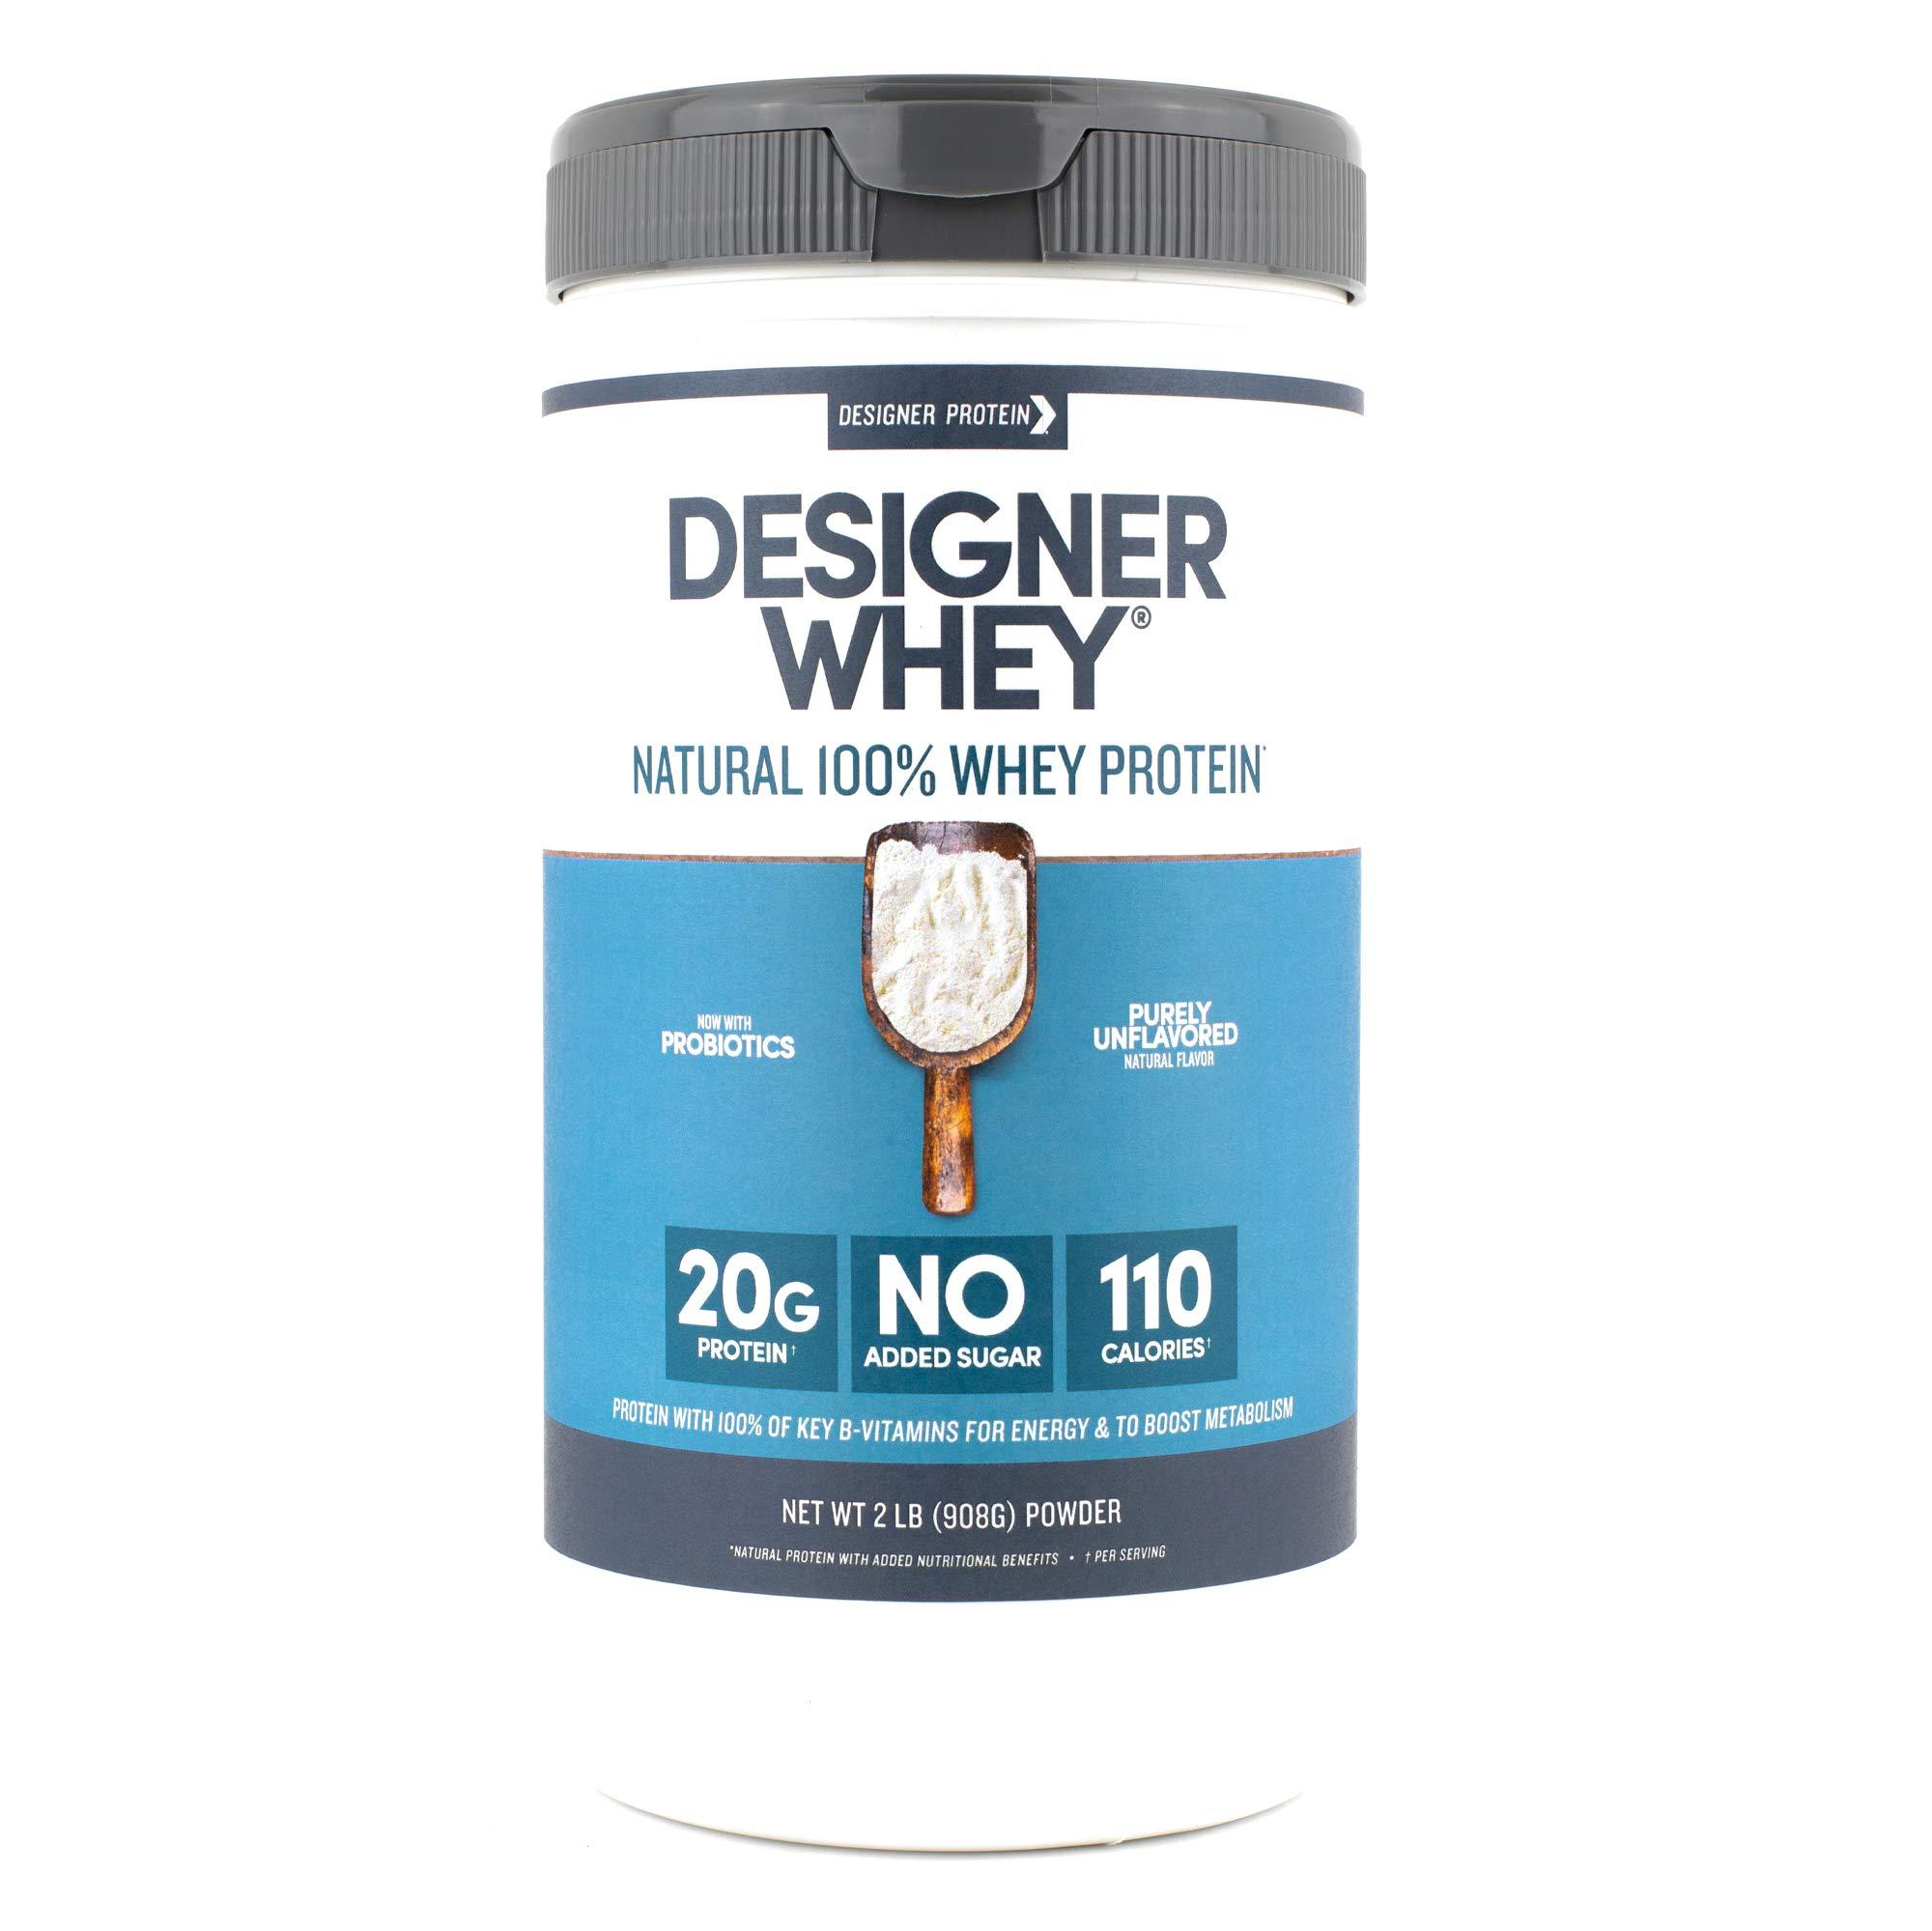 Designer Whey Protein Powder, Purely Unflavored, 2 Lb, Non GMO, Made in USA